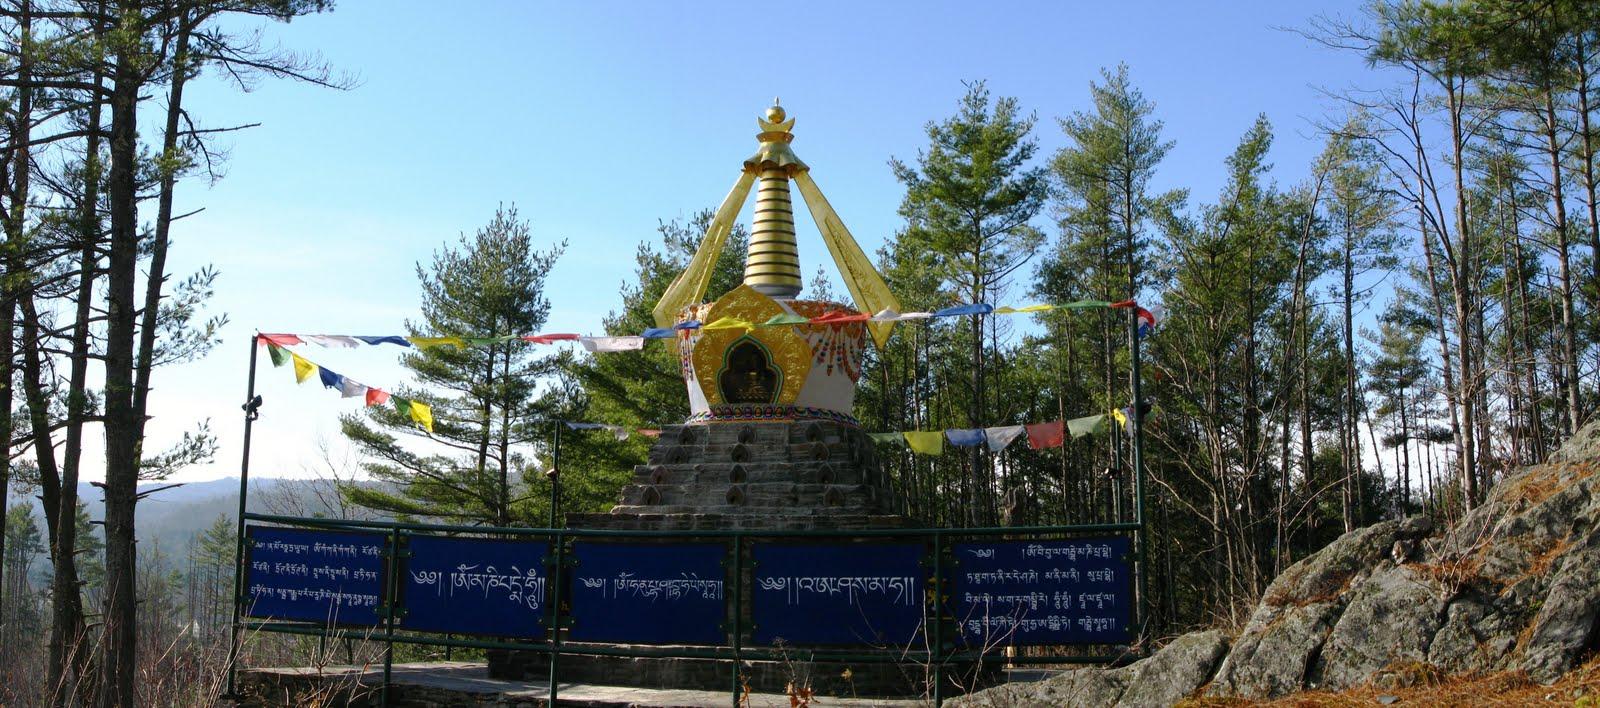 Stupa at Milarepa Center, Vermont, USA.